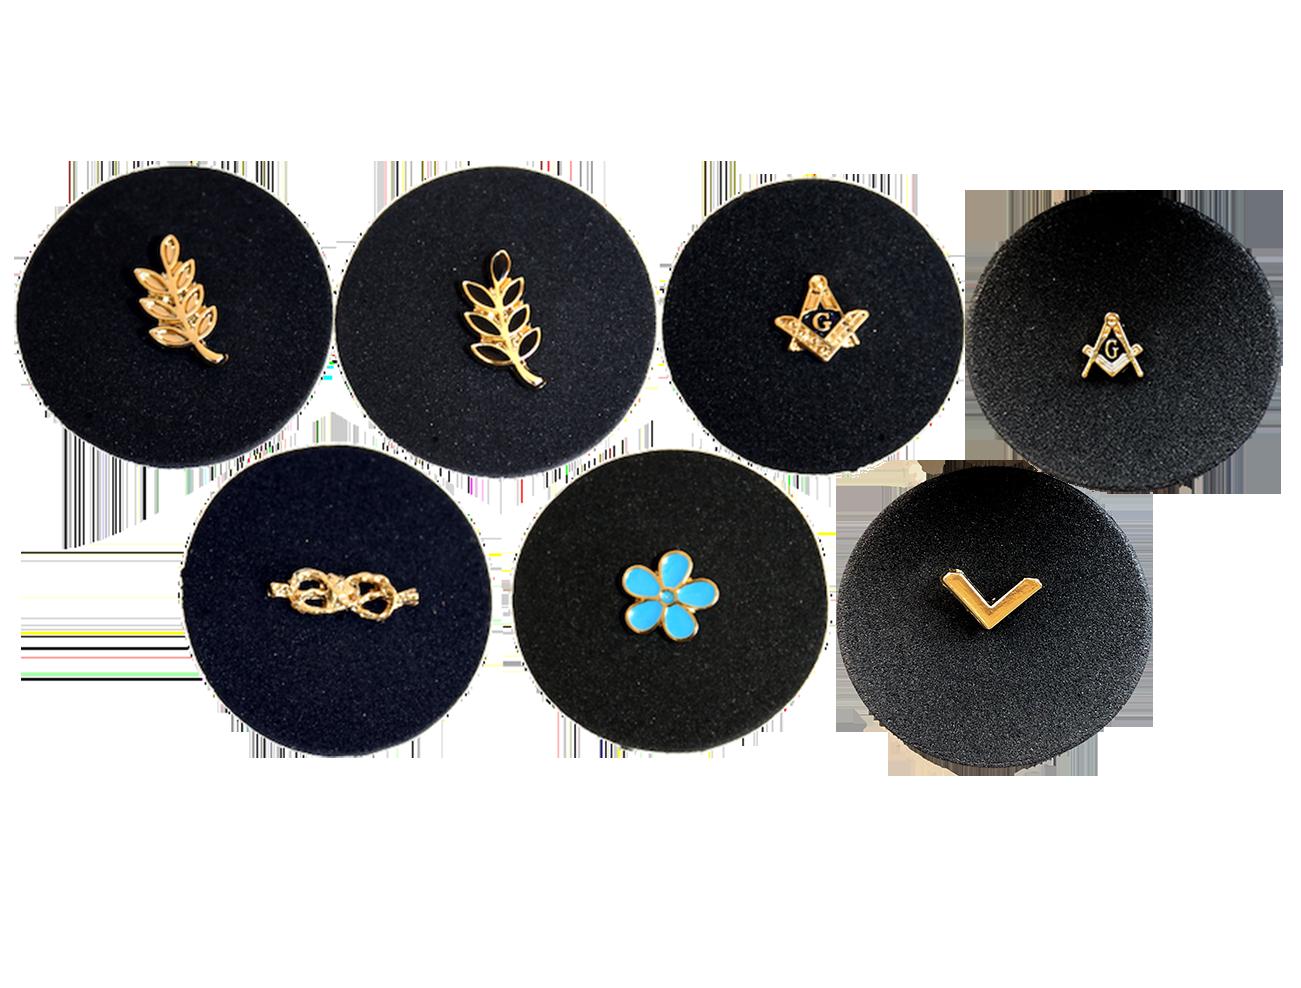 Spillapins da giacca in metallo, diversi simboli